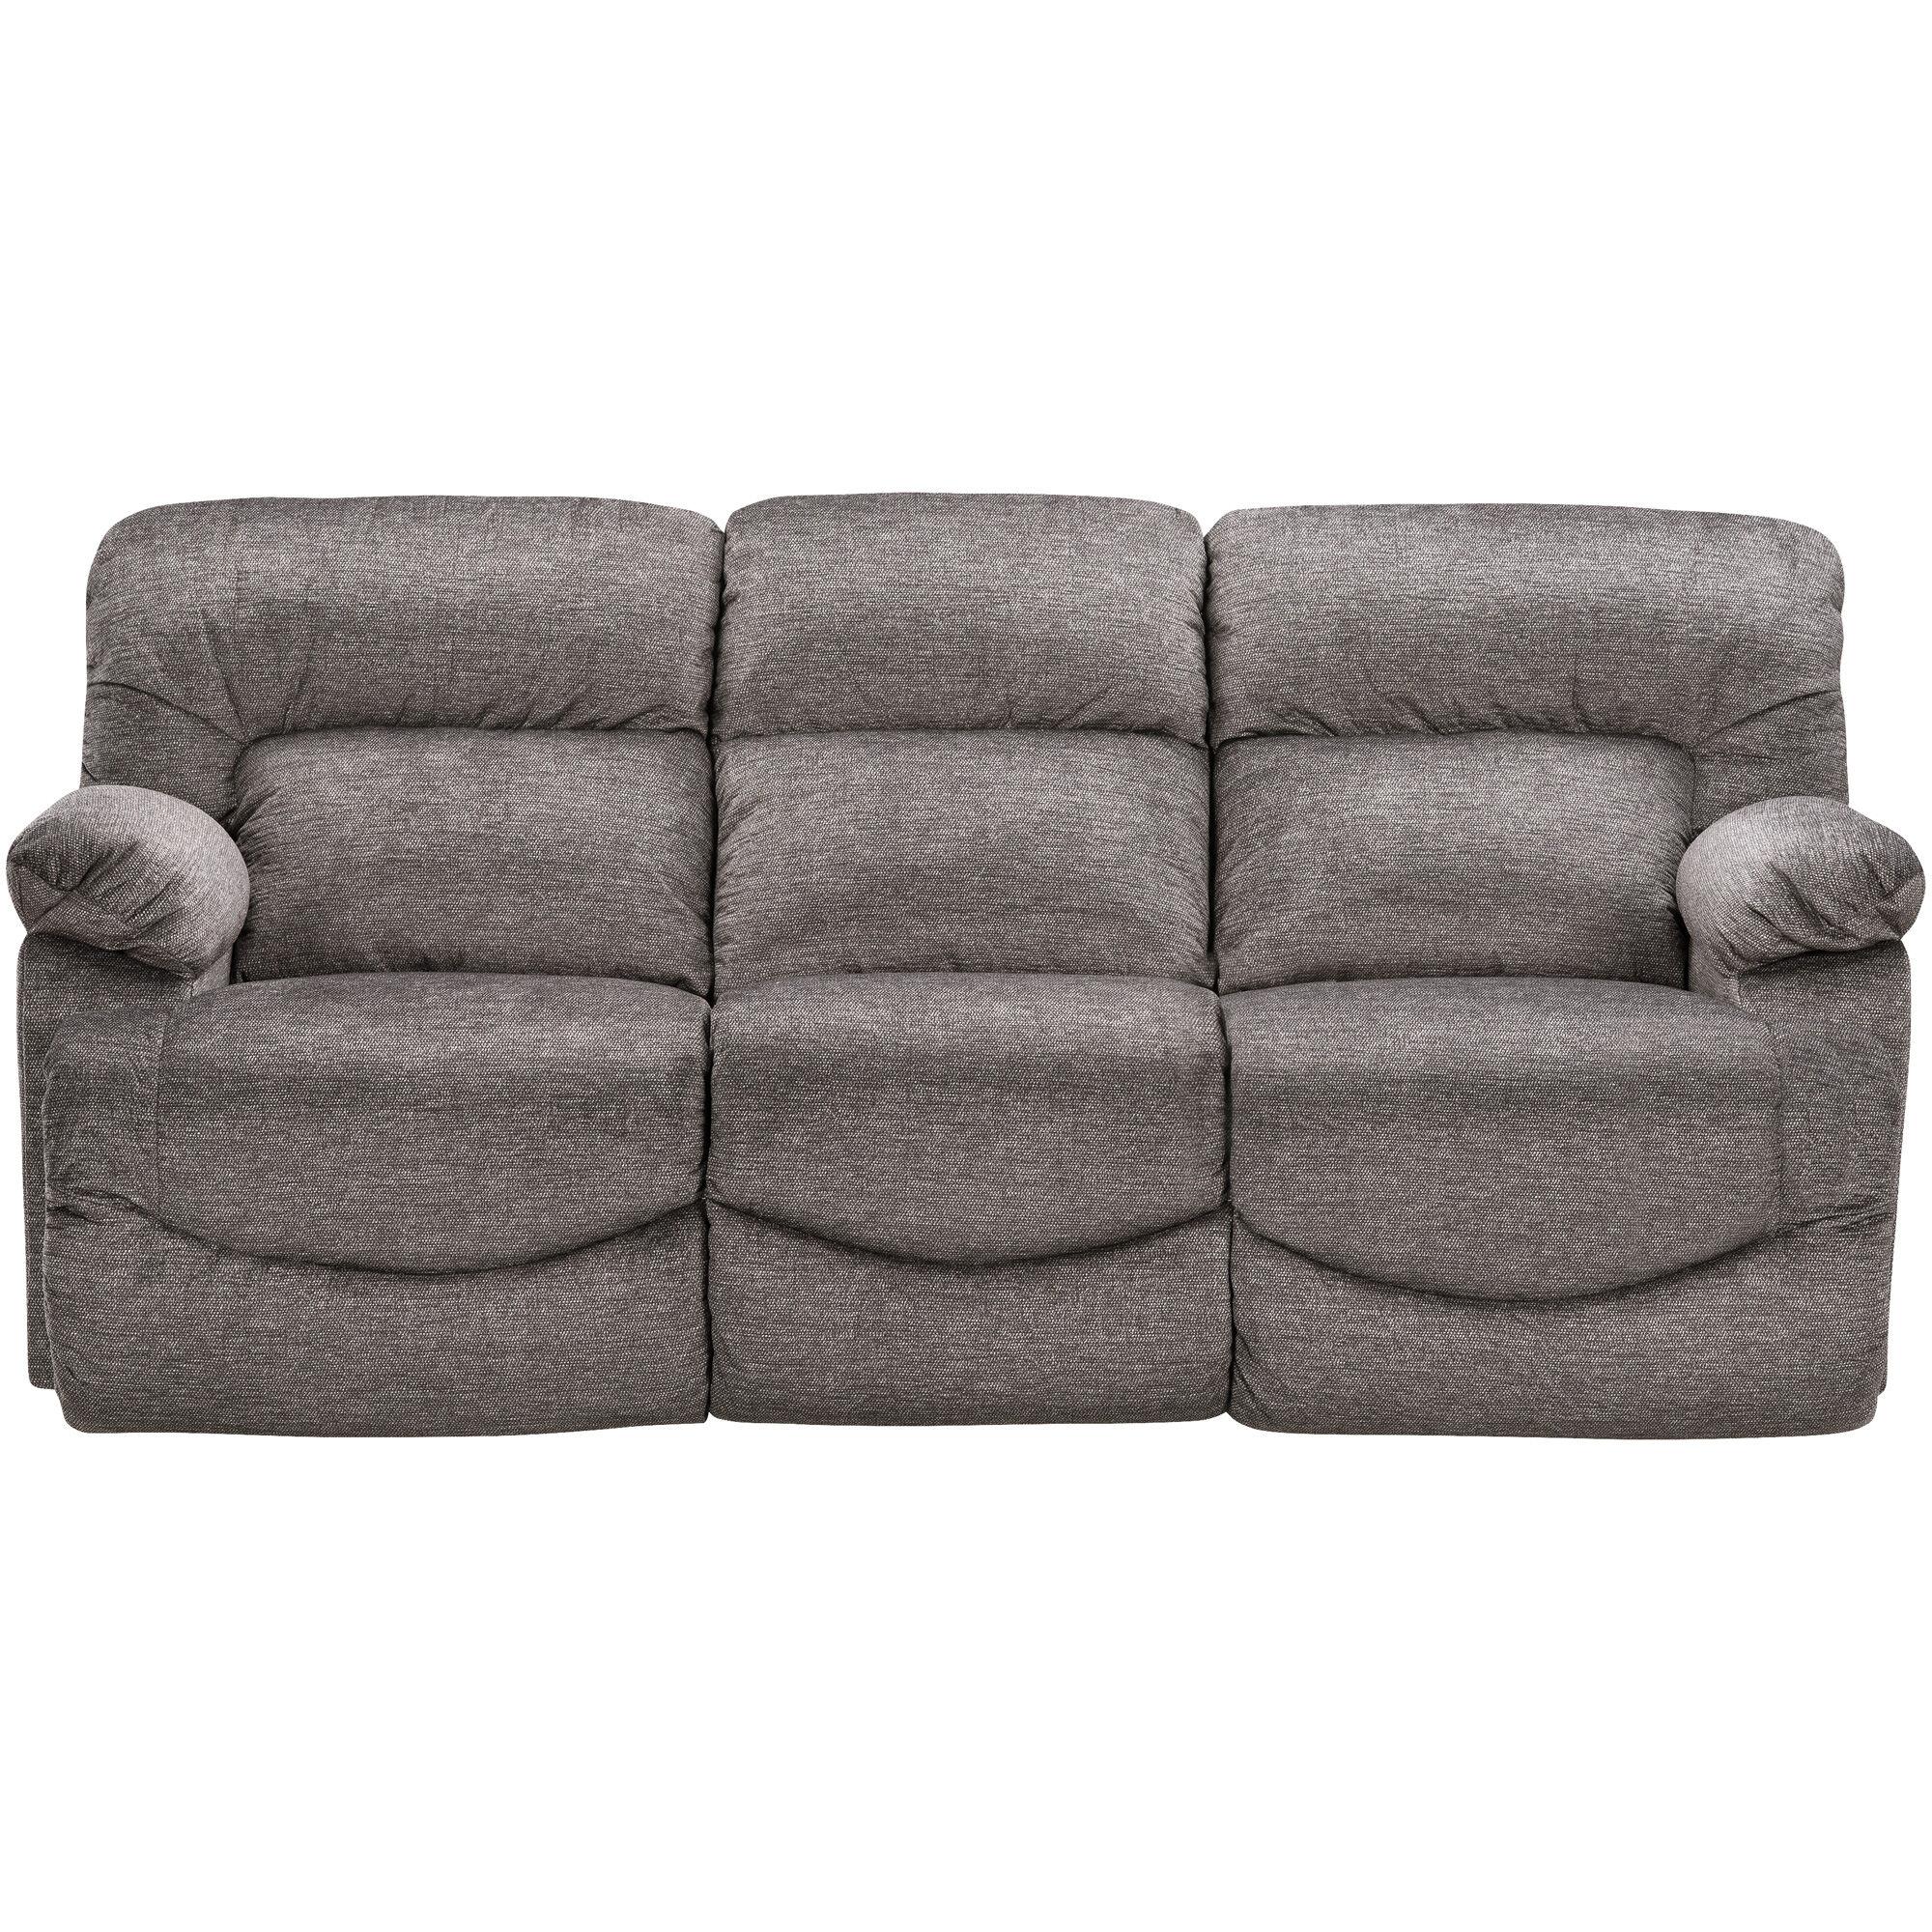 ... La-Z-Boy Asher Sable Reclining Sofa ...